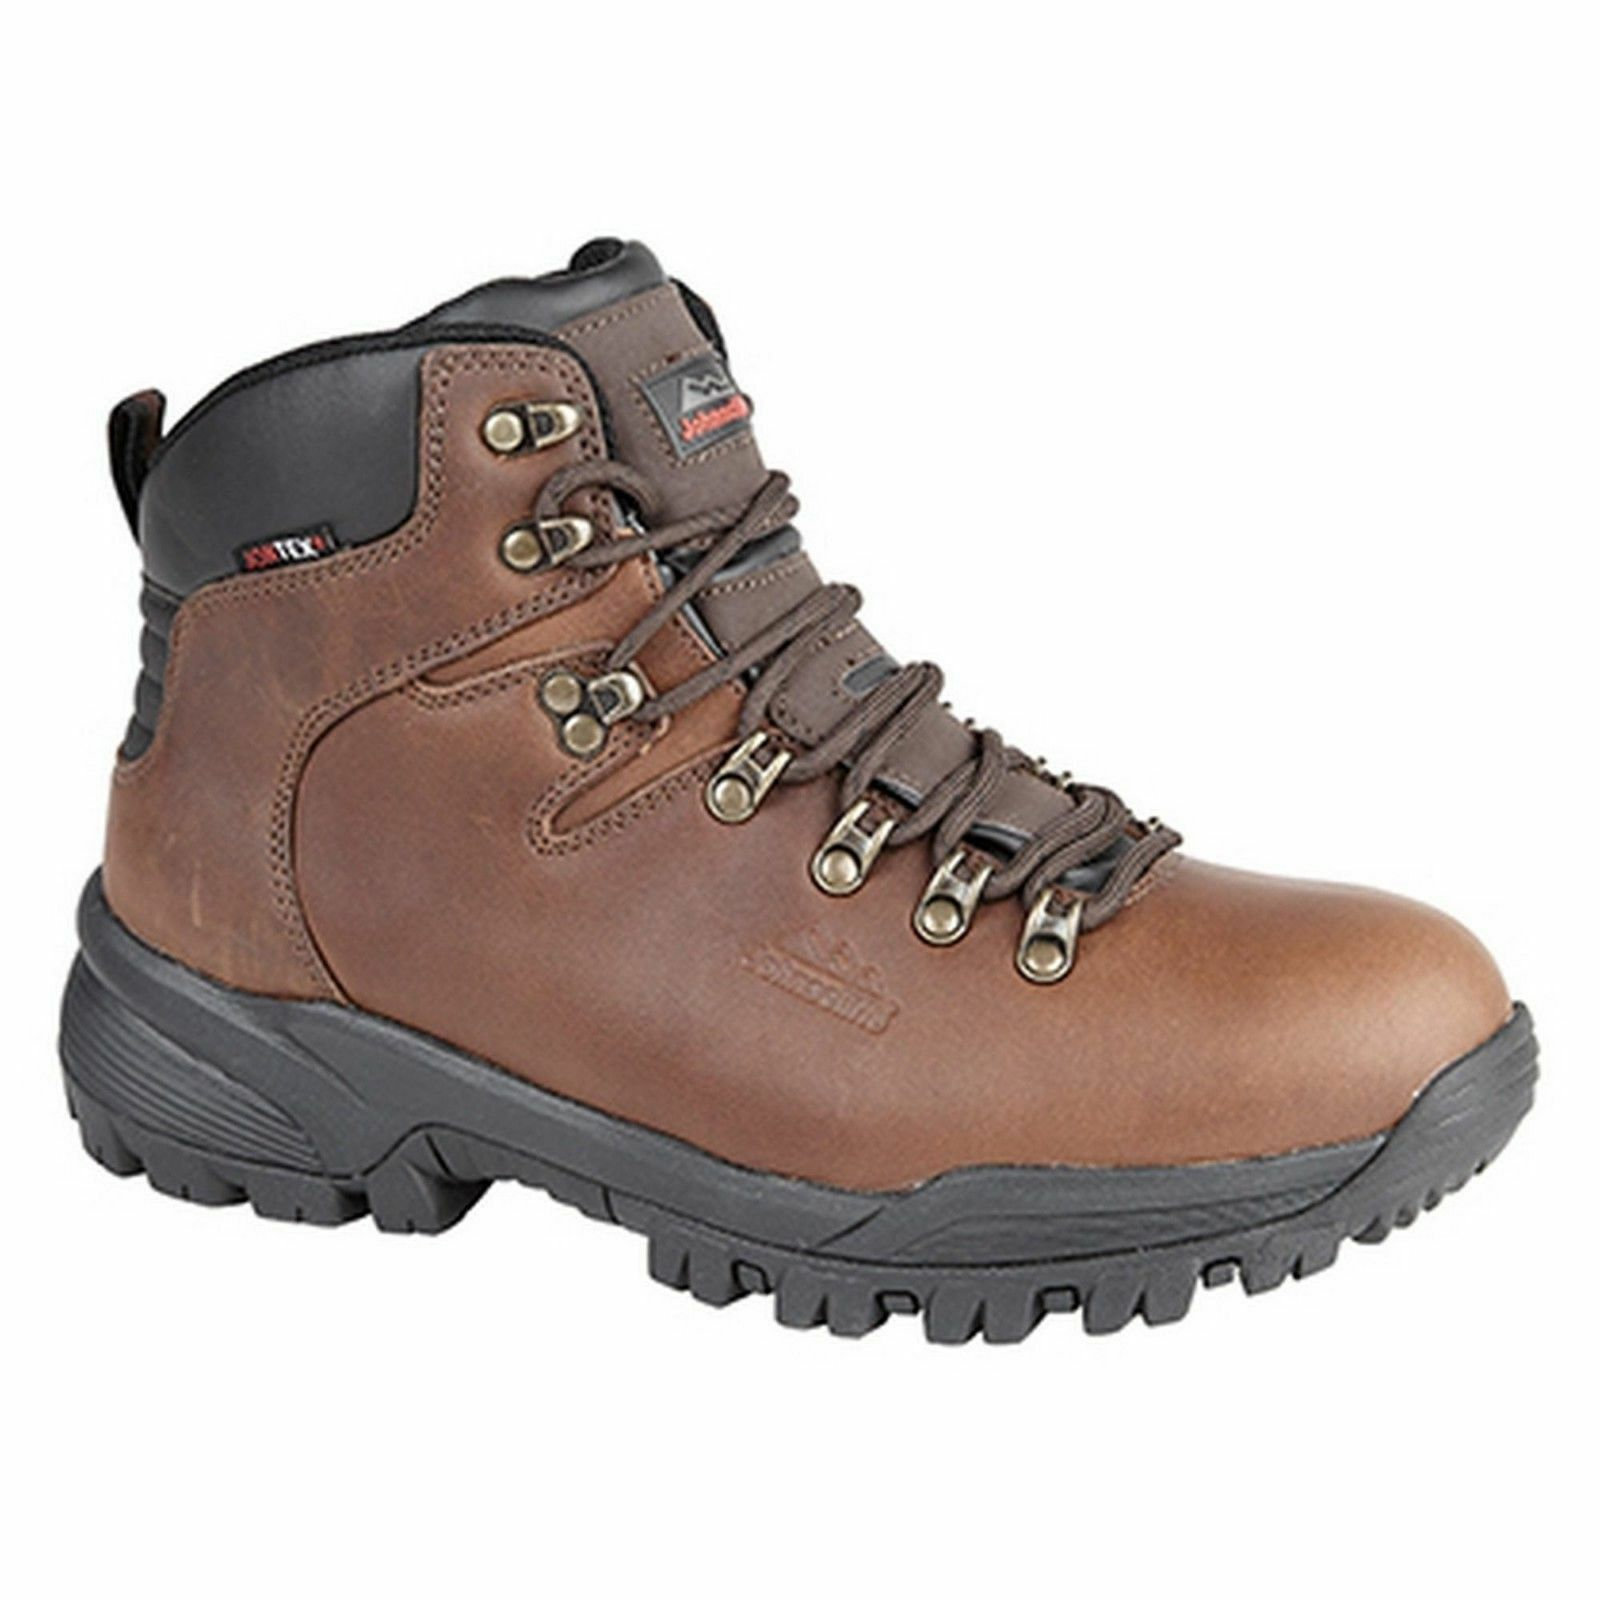 Johnscliffe  Herren Canyon Leder Hillwalking Hiking Schuhes Boy Hillwalking Leder Trail Trek Stiefel UK 6e218a